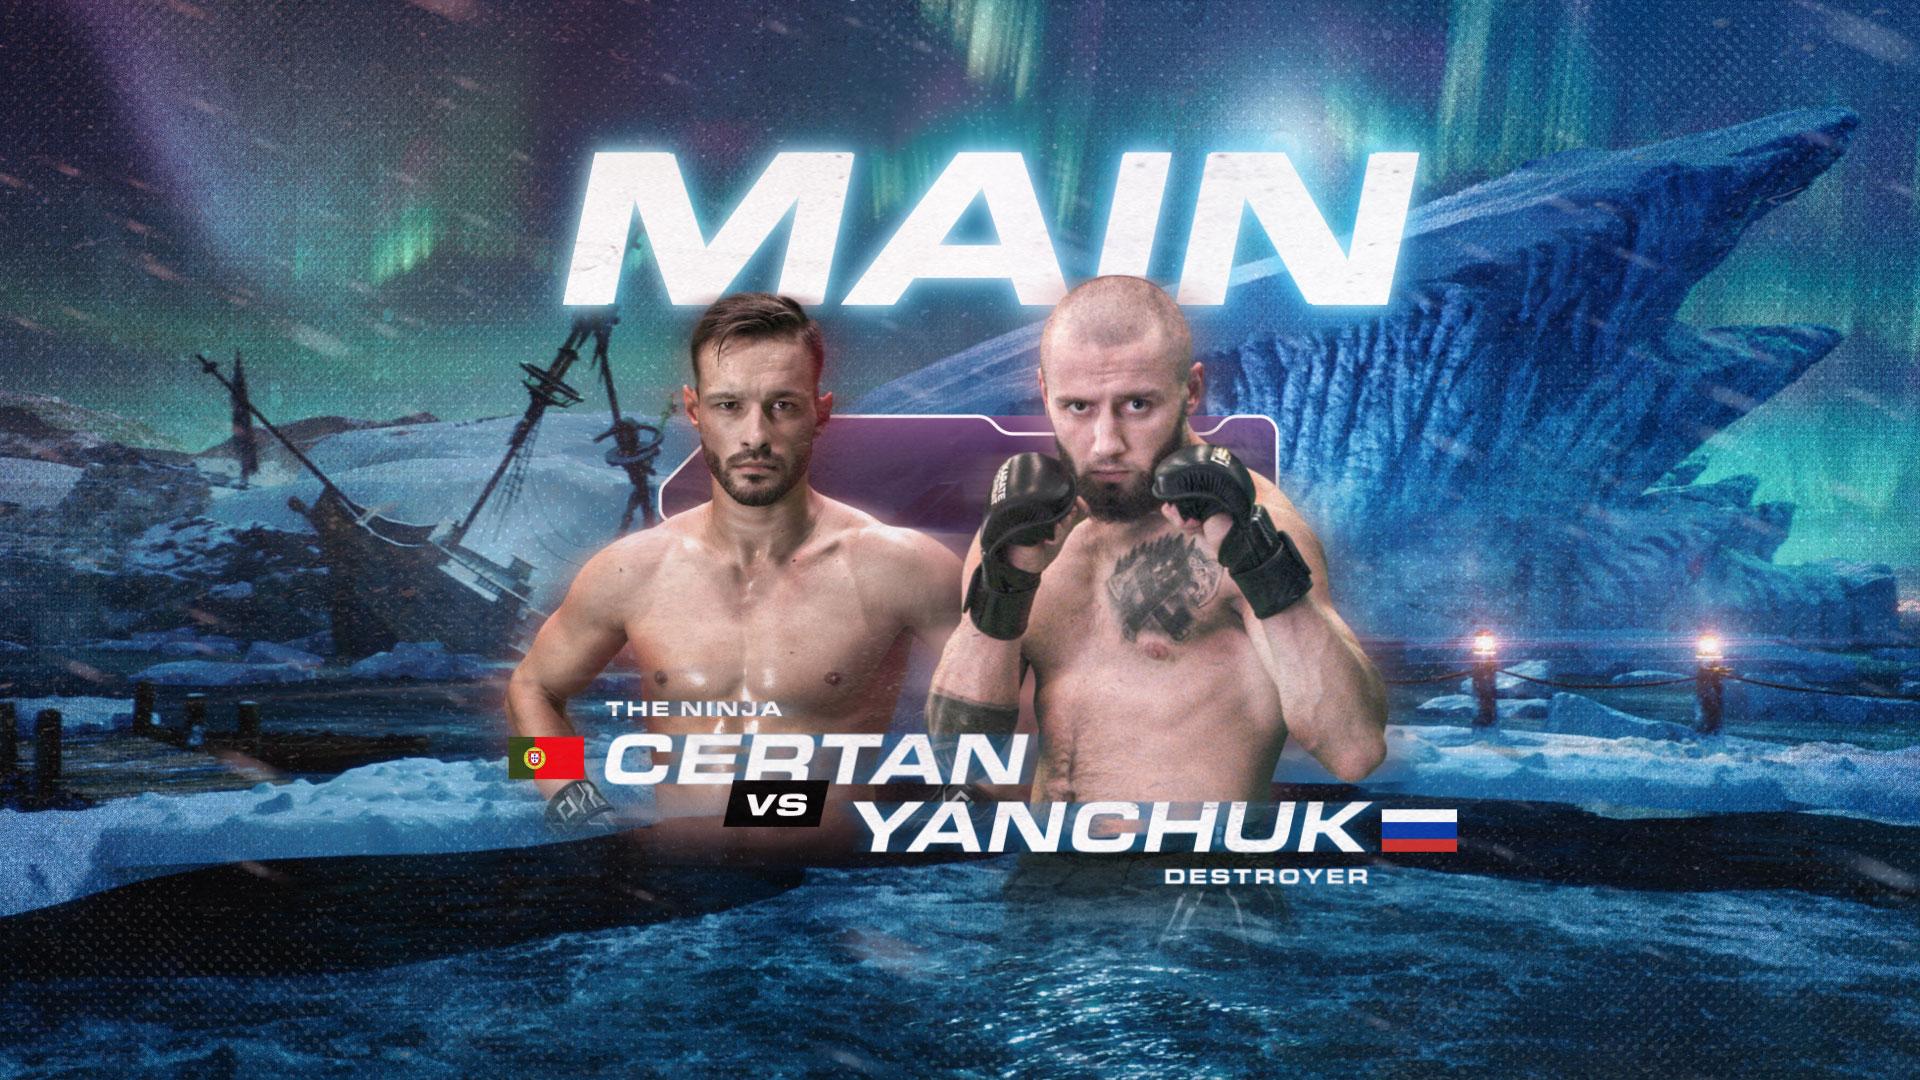 Certan vs Yanchuk